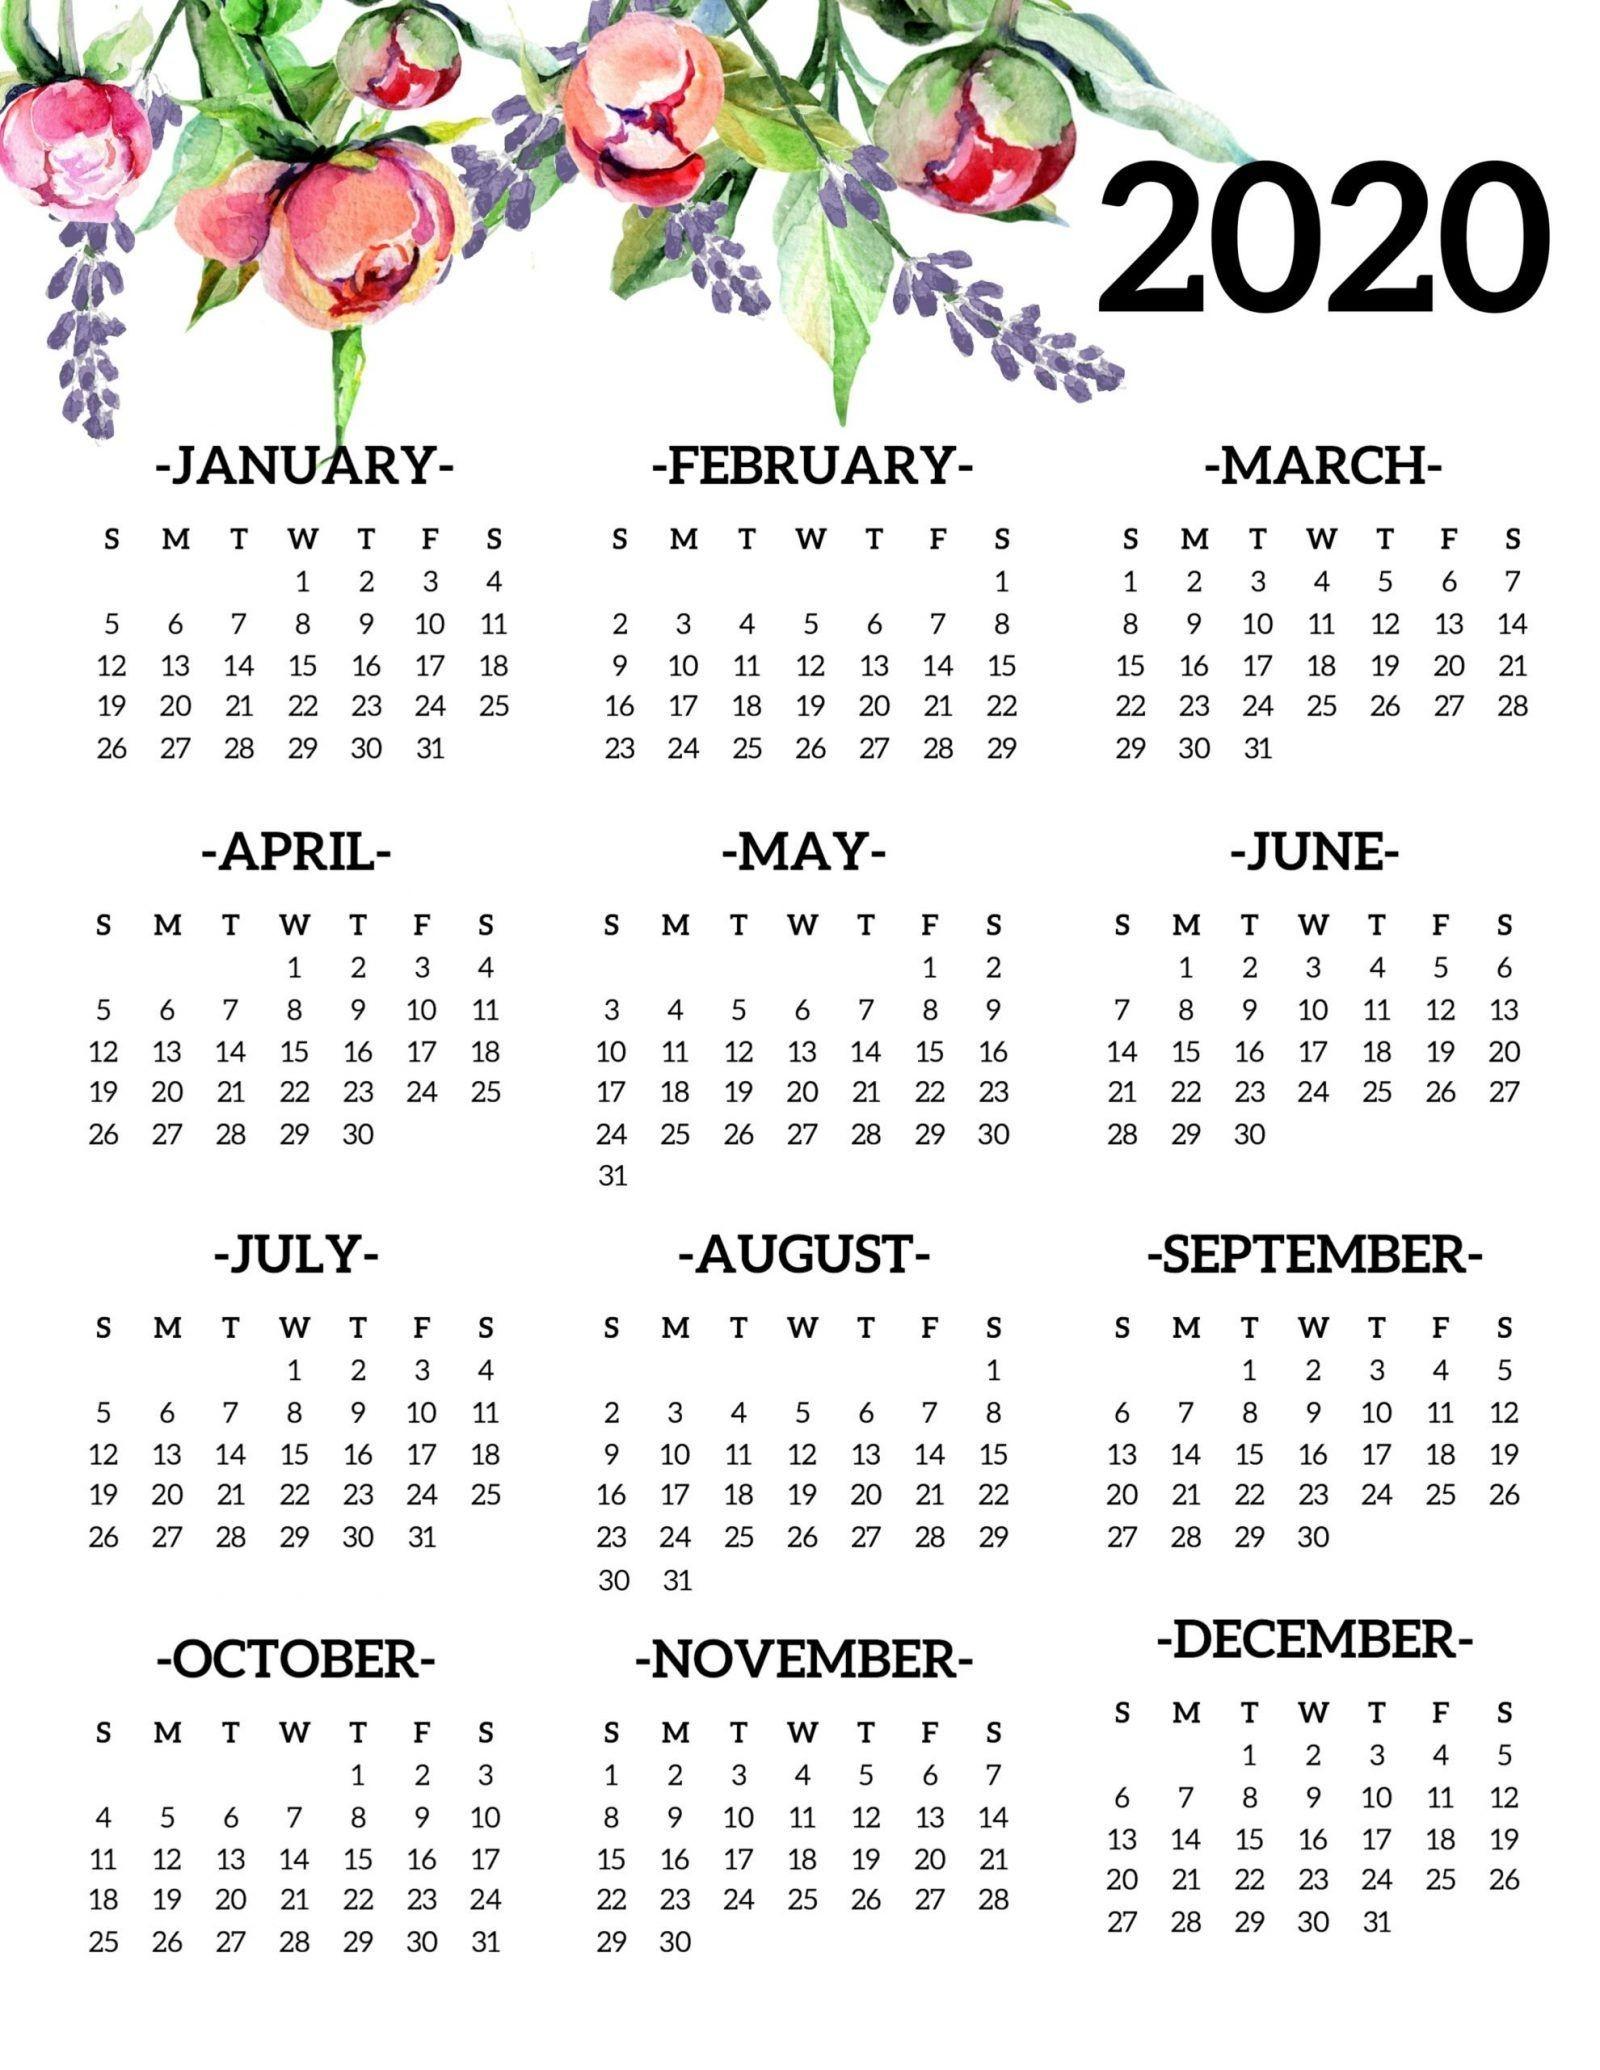 20 Free Printable Calendars For 2020 | Free Printable  2020 Calendar Year Printable